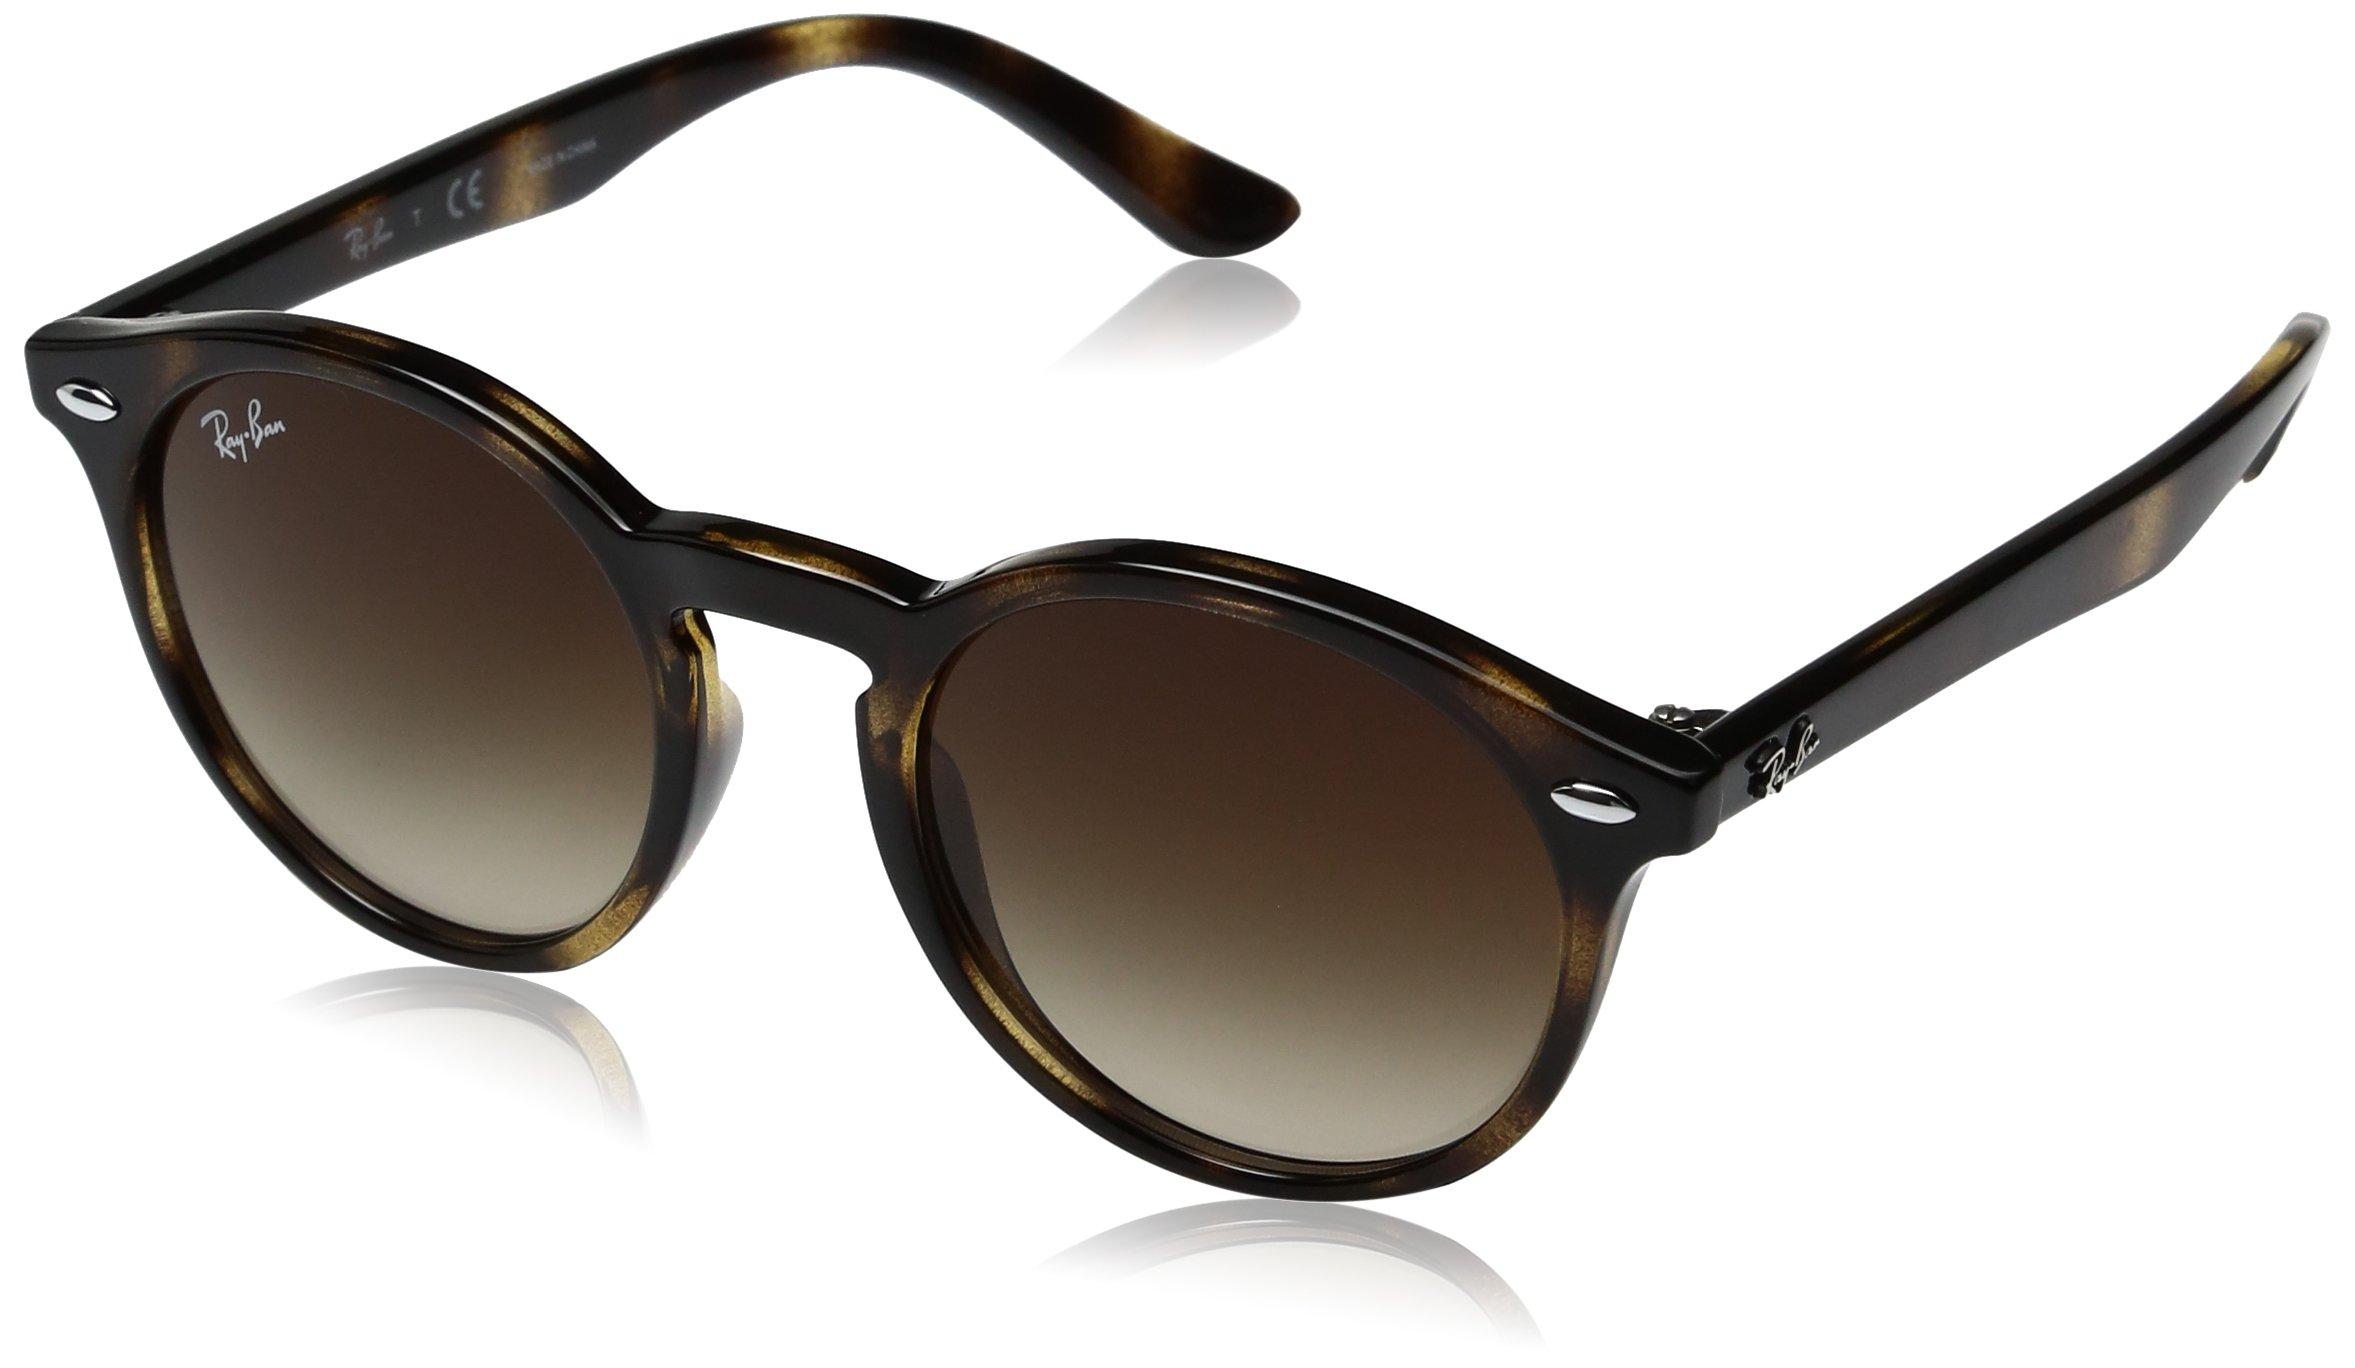 Ray-Ban Junior RJ9064S Round Kids Sunglasses, Shiny Tortoise/Brown Gradient, 44 mm